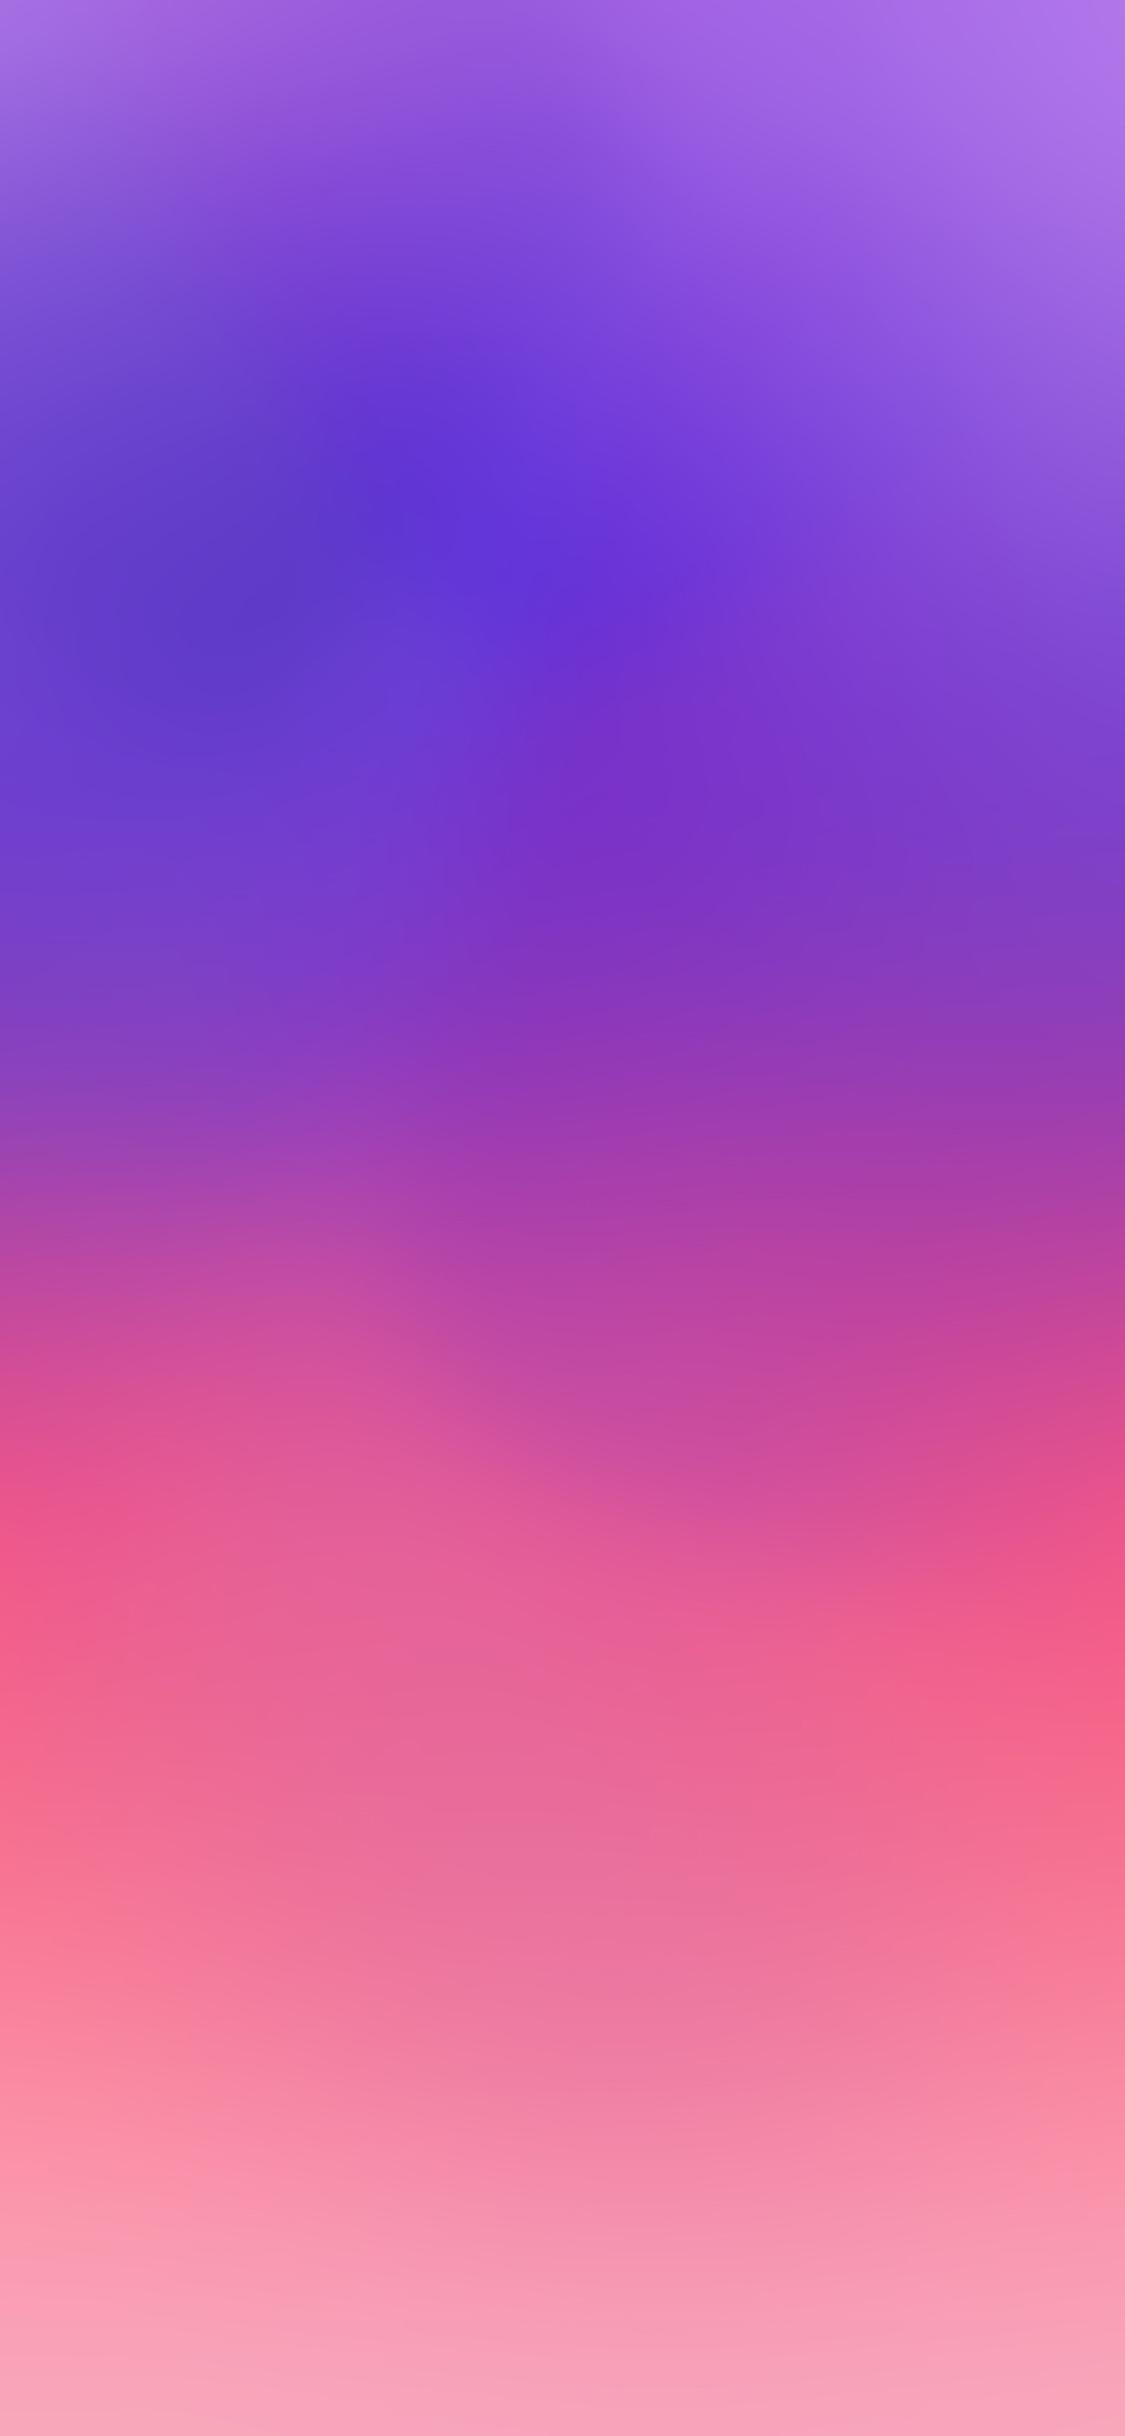 iPhoneXpapers.com-Apple-iPhone-wallpaper-sf68-pink-purple-lady-bottle-gradation-blur